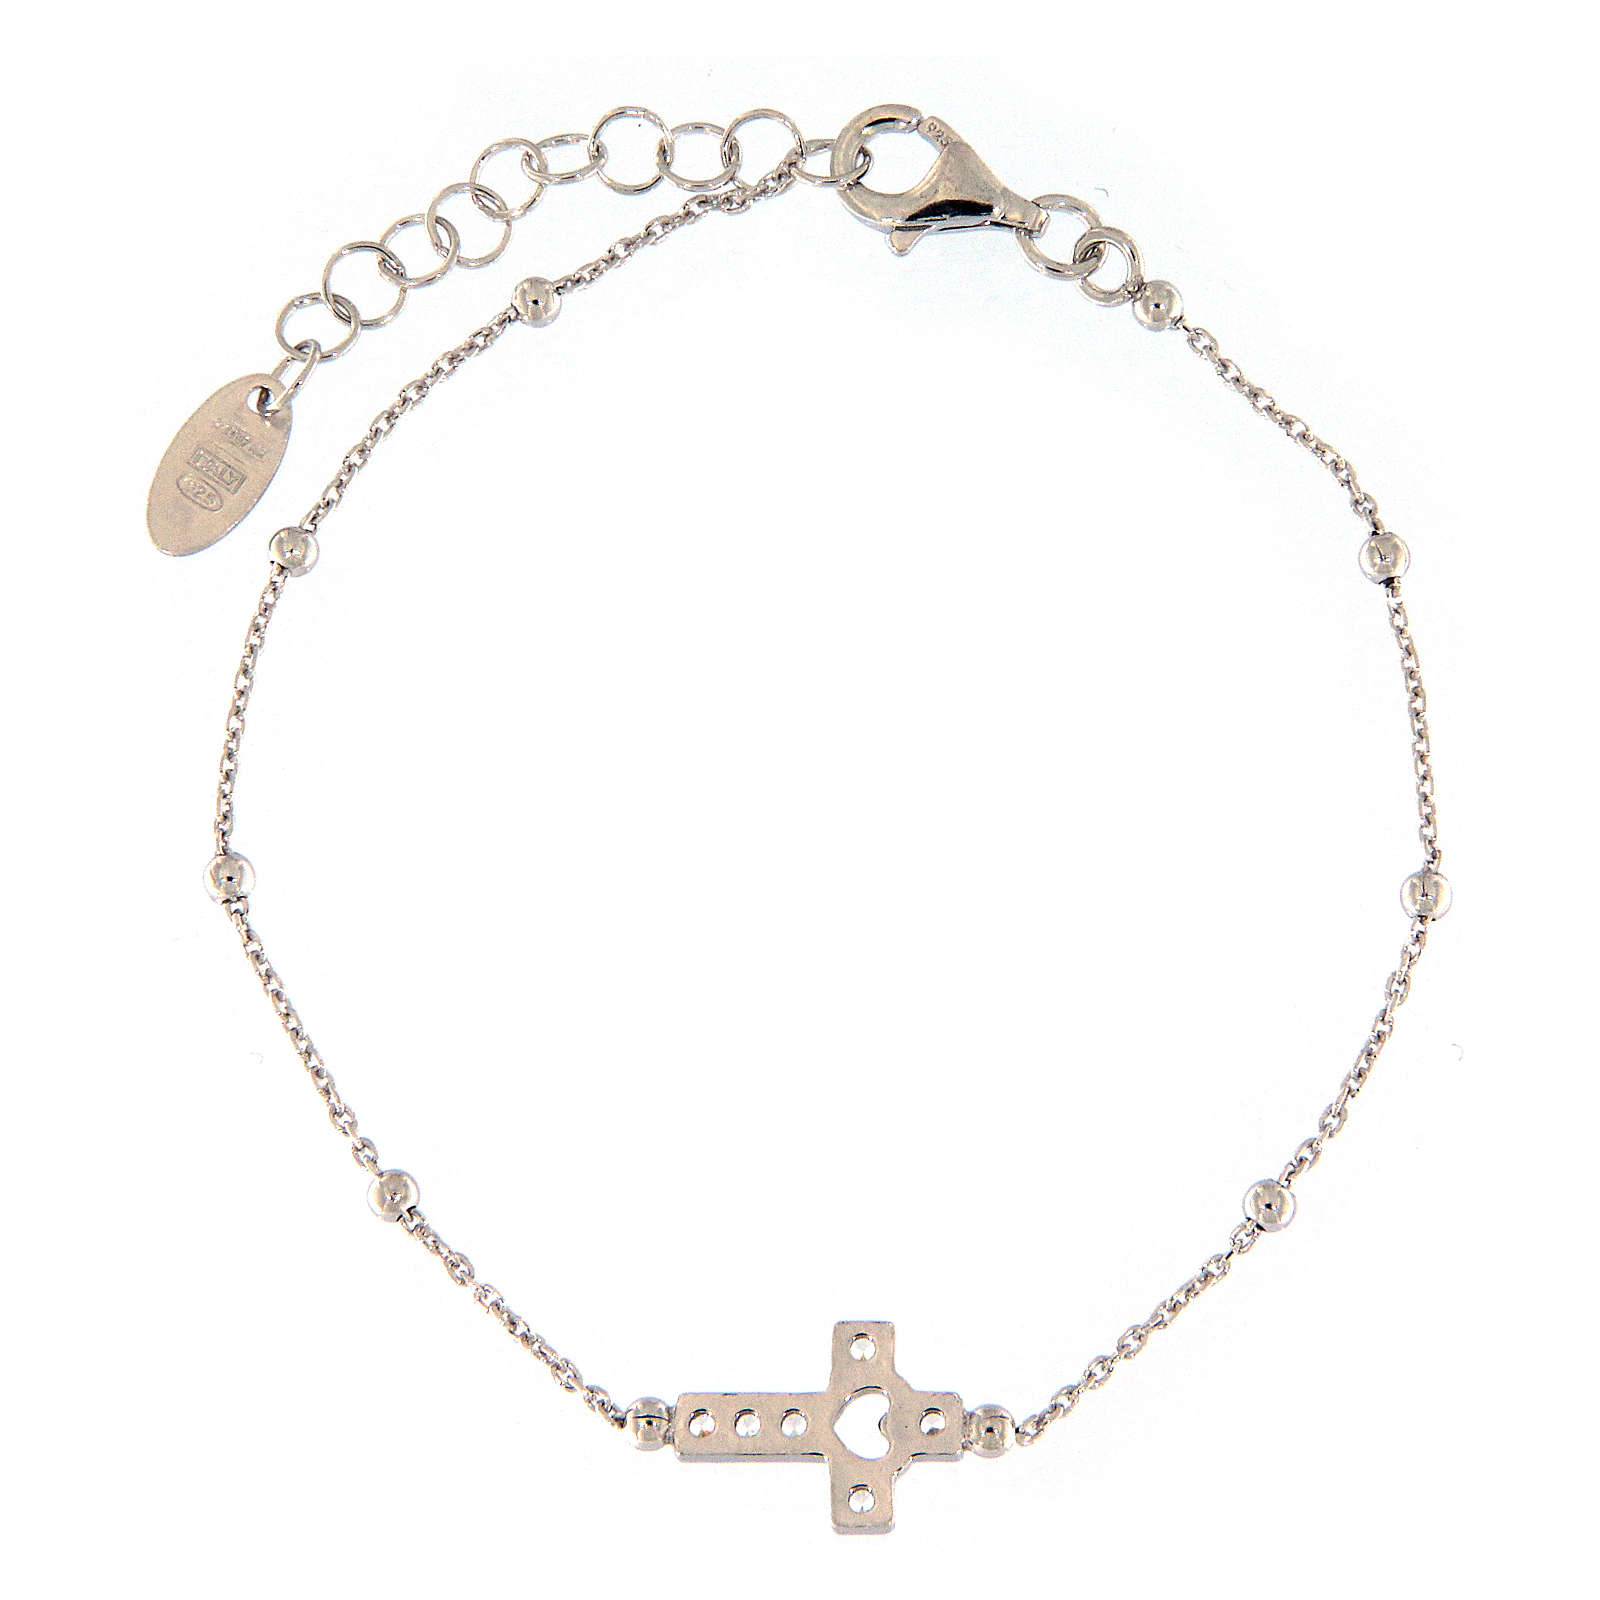 Bracciale AMEN argento 925 rodio zirconi bianchi 4